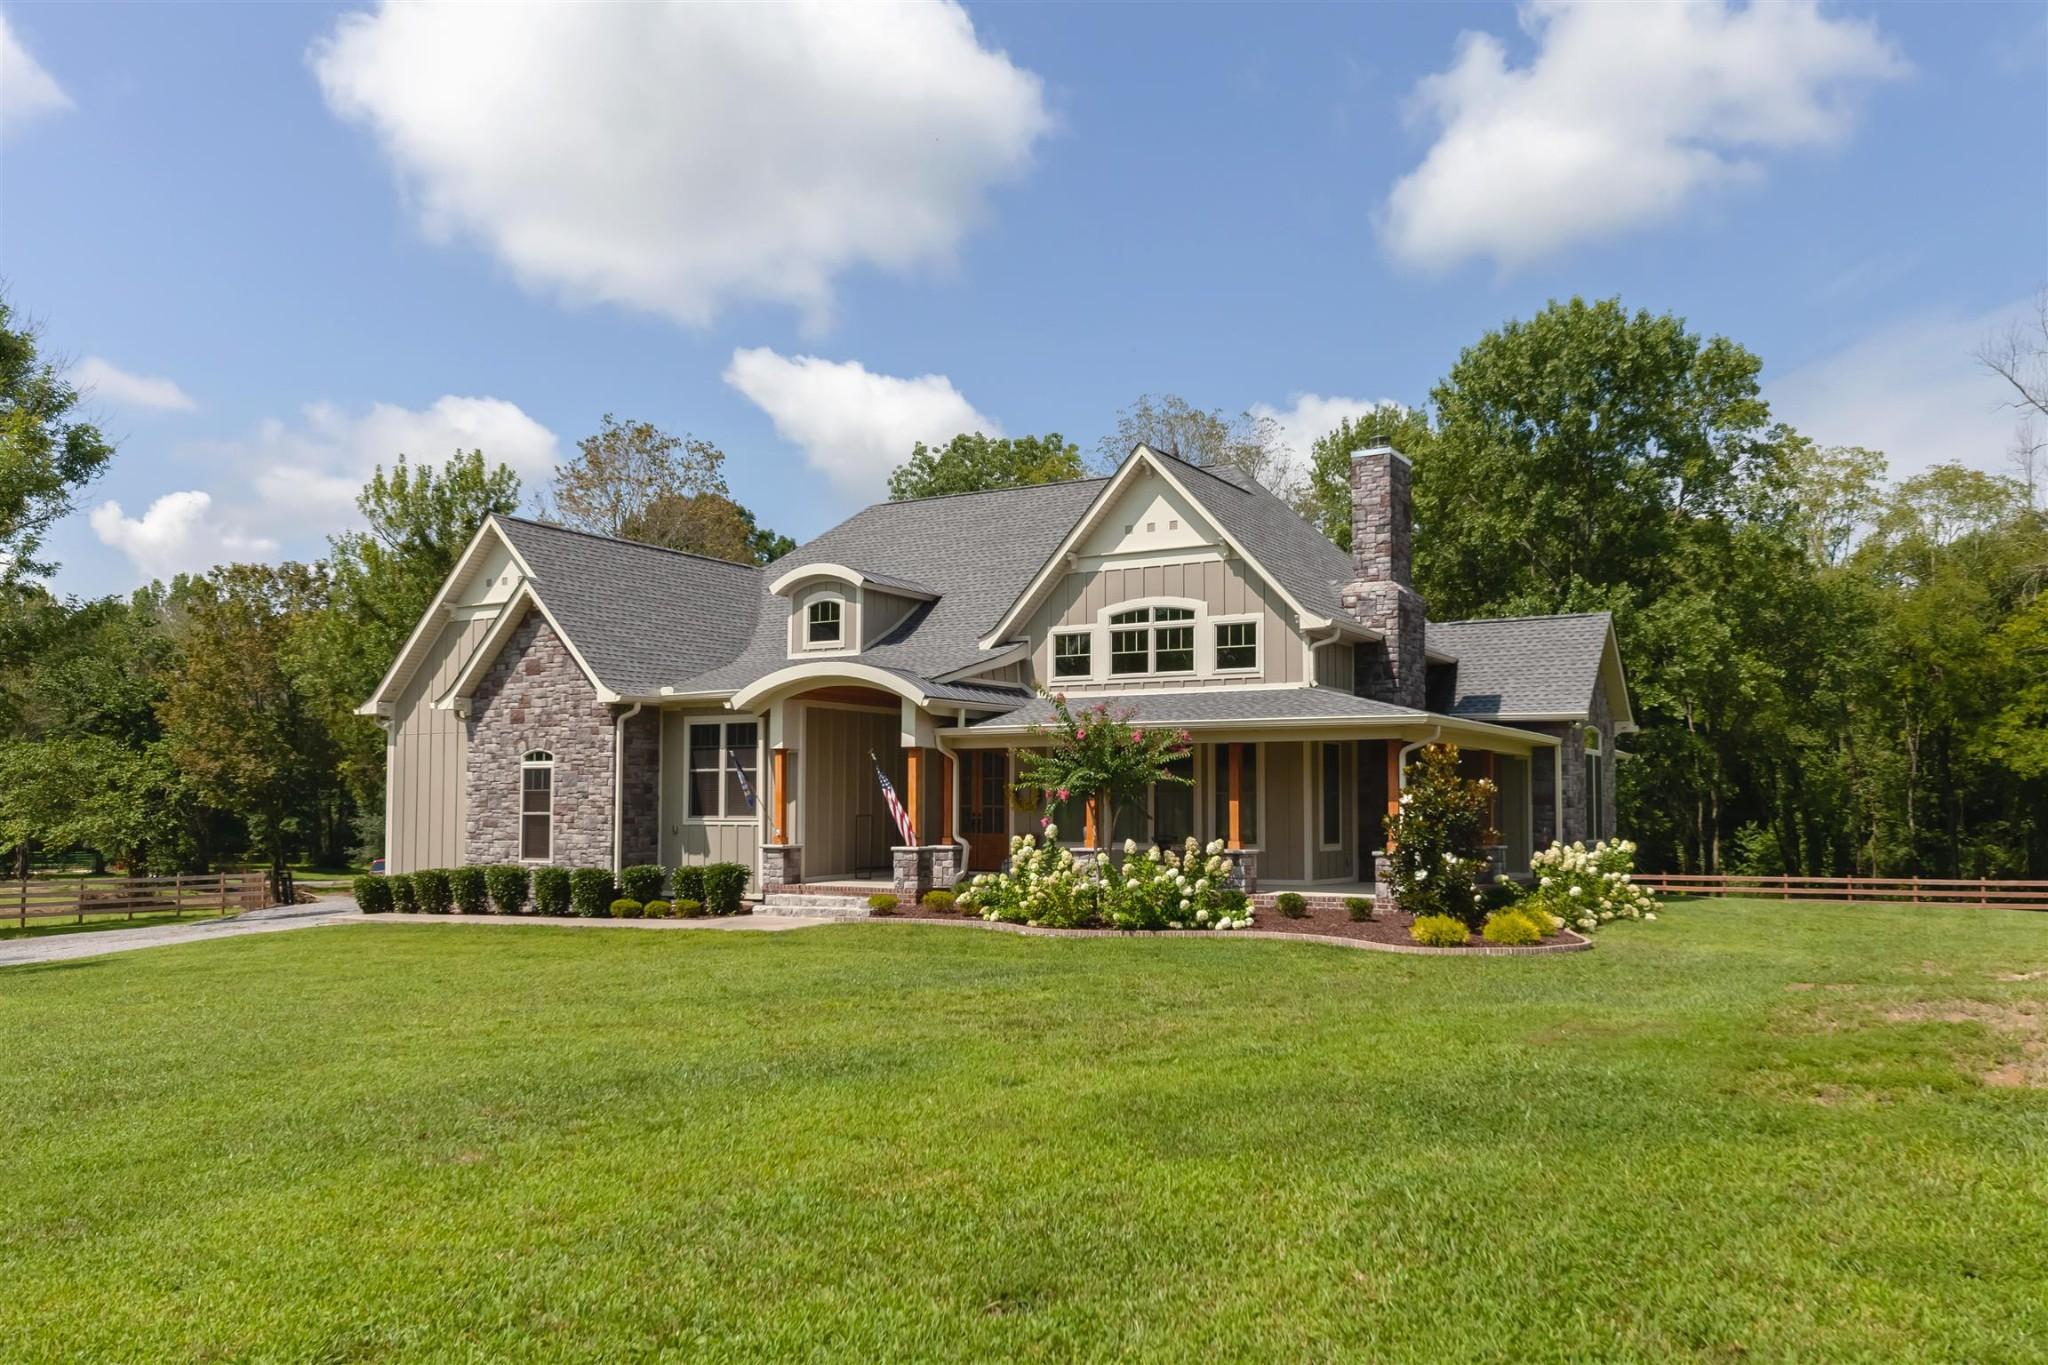 123 MT. OLIVET ROAD, Wartrace, TN 37183 - Wartrace, TN real estate listing